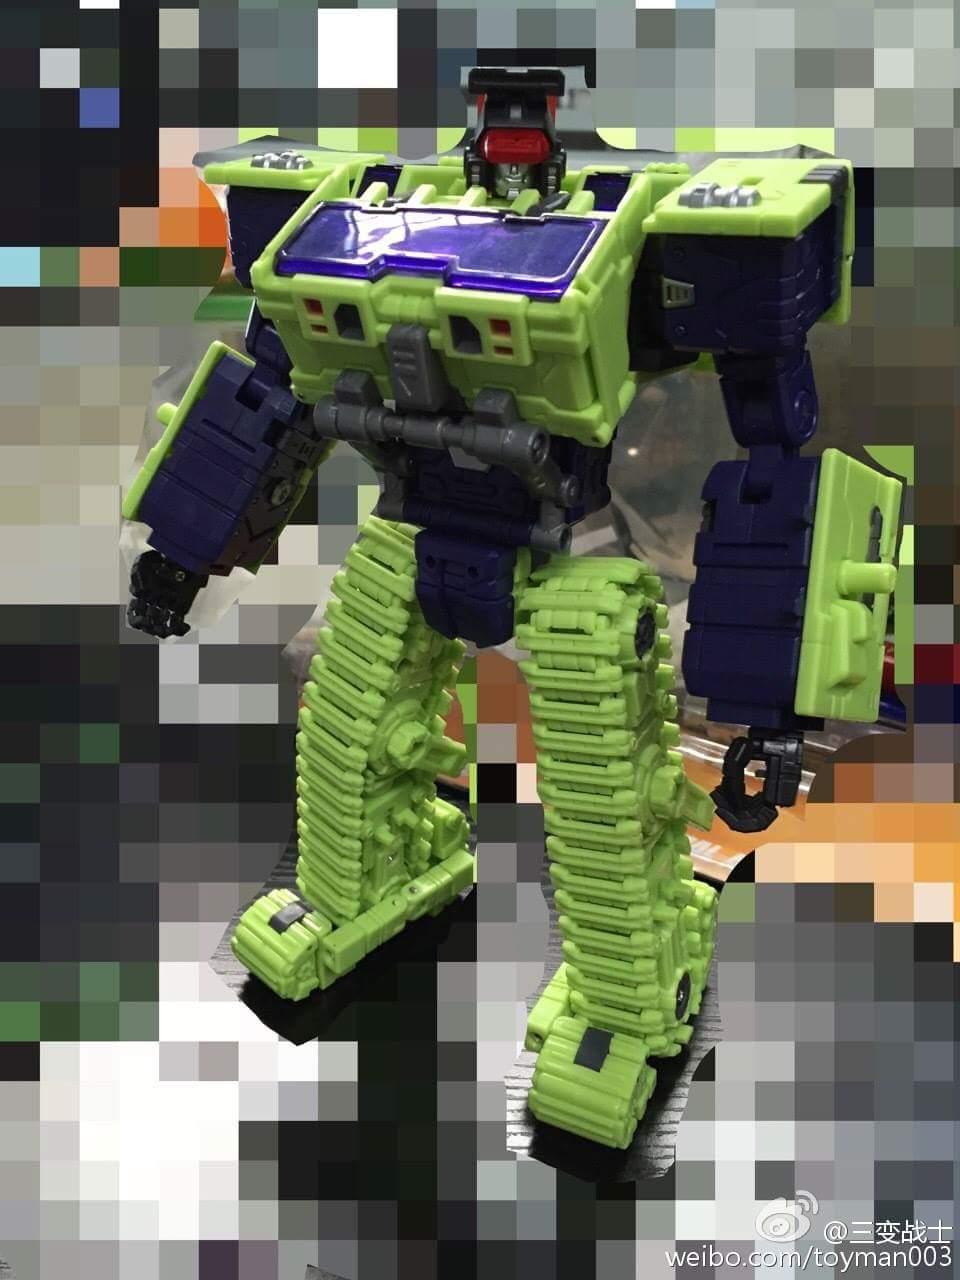 [Toyworld] Produit Tiers - Jouet TW-C Constructor aka Devastator/Dévastateur (Version vert G1 et jaune G2) - Page 2 2FeBzWFt